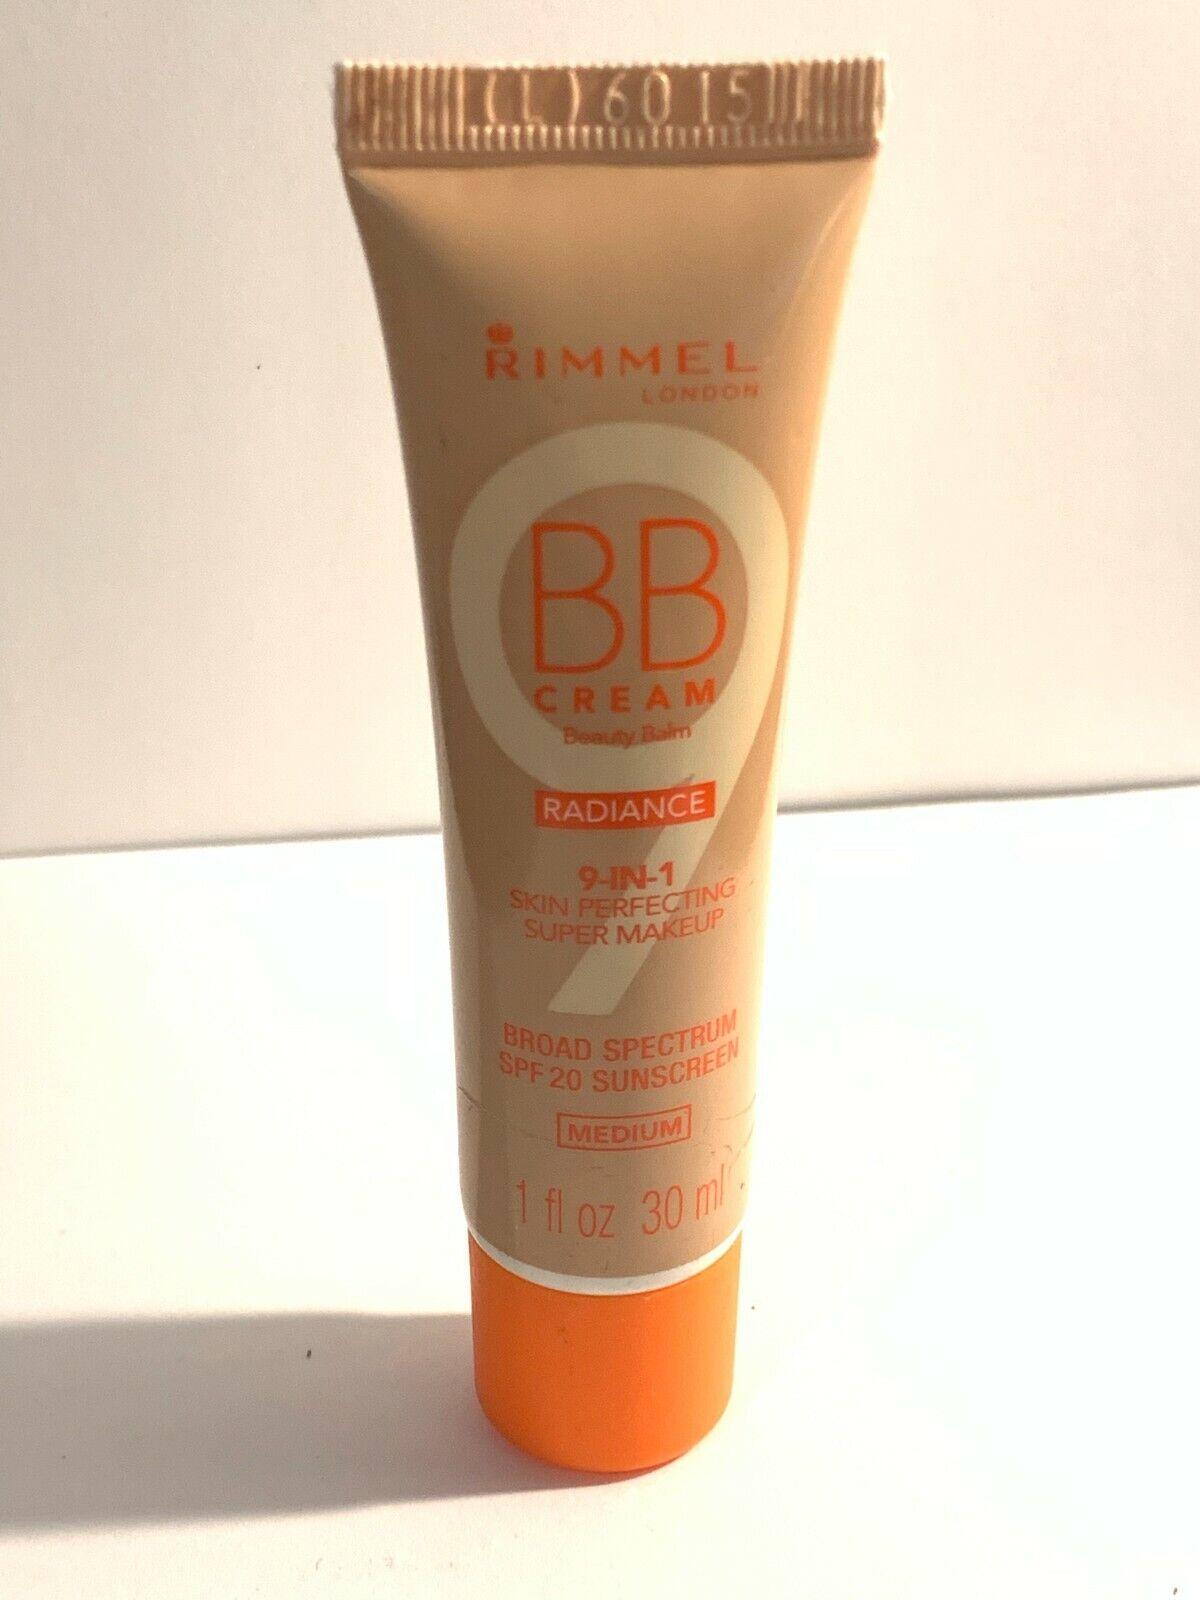 Rimmel London BB cream 9-in-1 beauty balm with sunscreen SPF